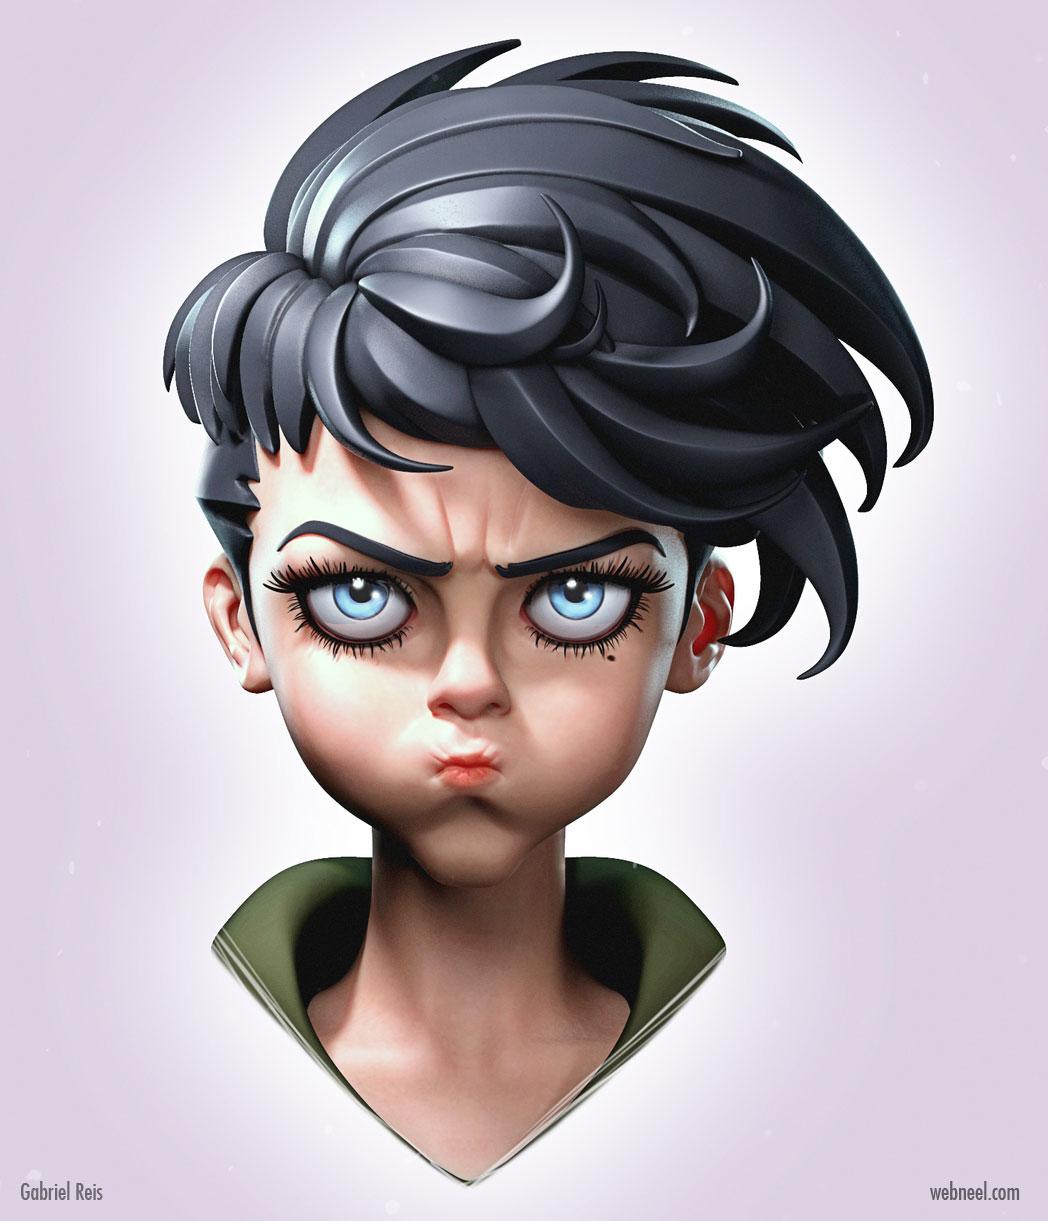 3d model face funny grumpy girl by gabrielreis